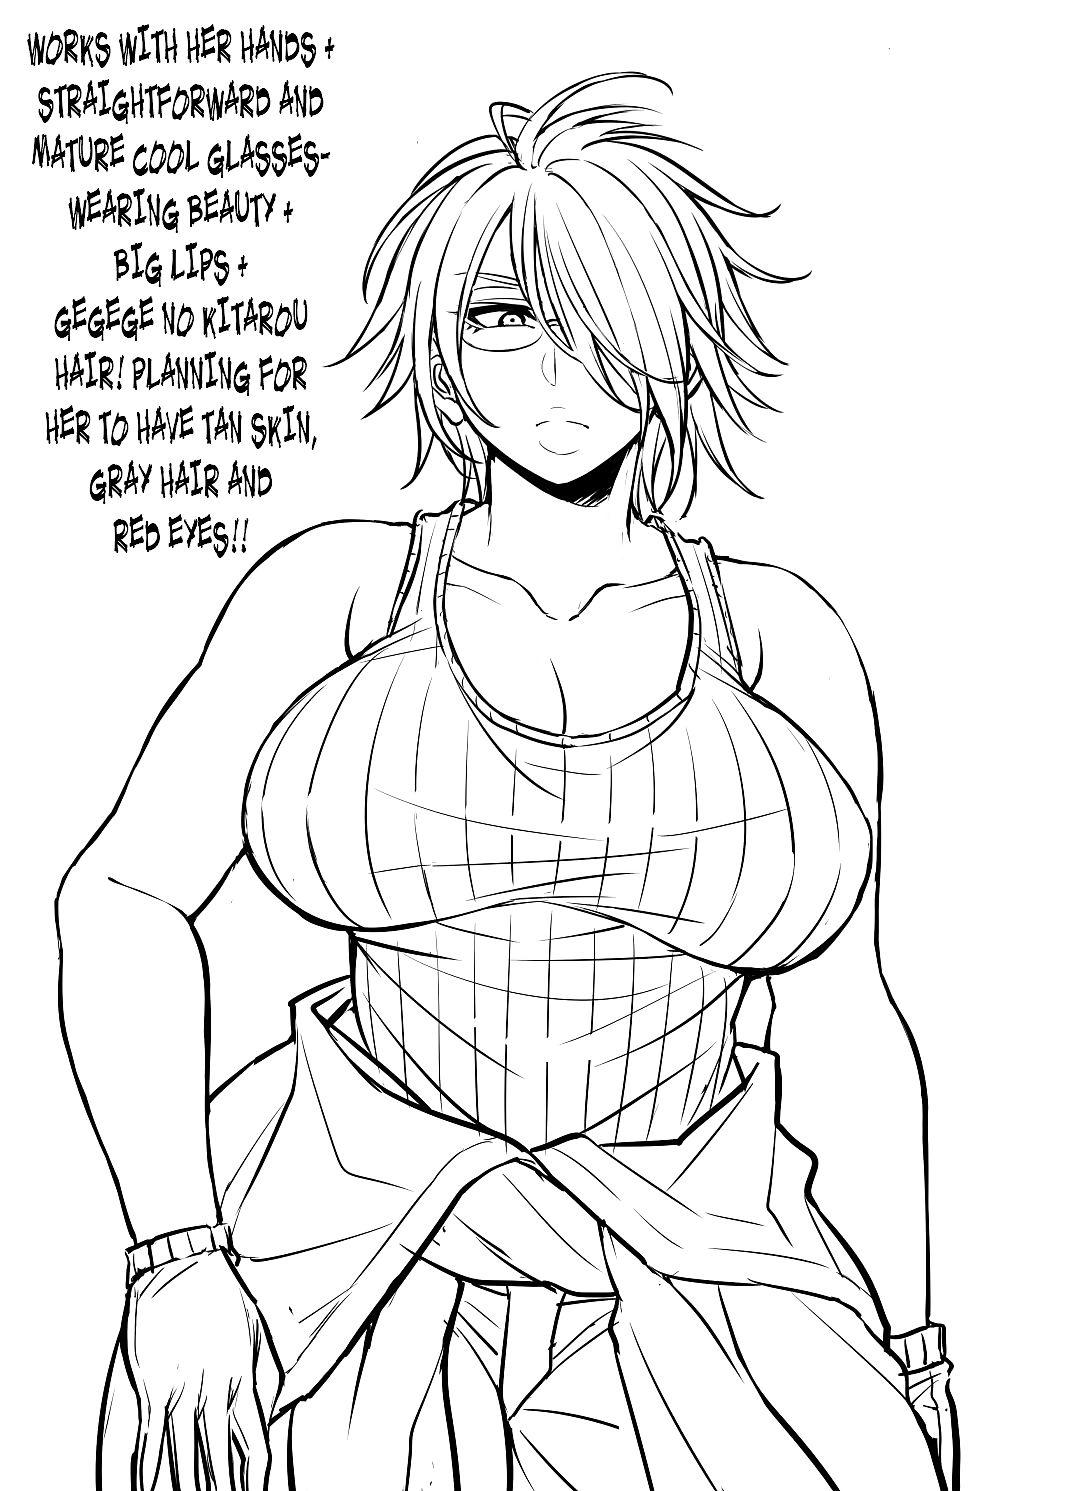 Nekura Megane ♀ - Make an issue of Uncanny Glasses Sweeping - attaching 8